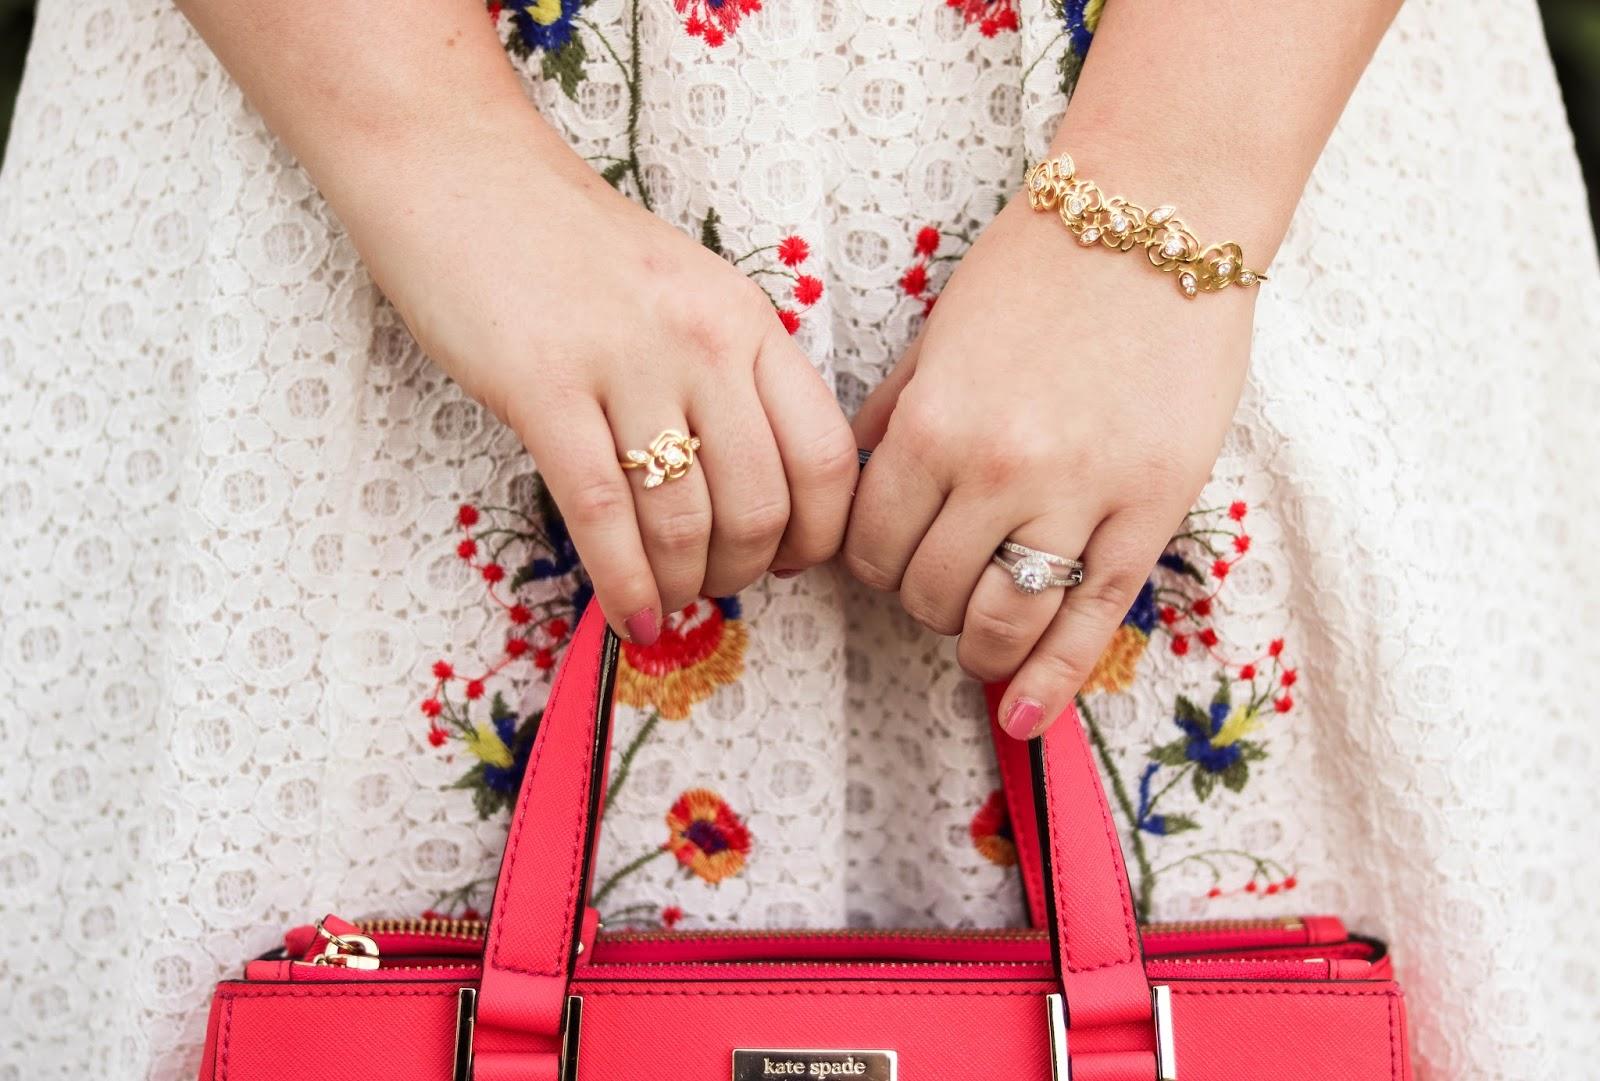 Elizabeth Hugen of Lizzie in Lace styles gold floral jewelry